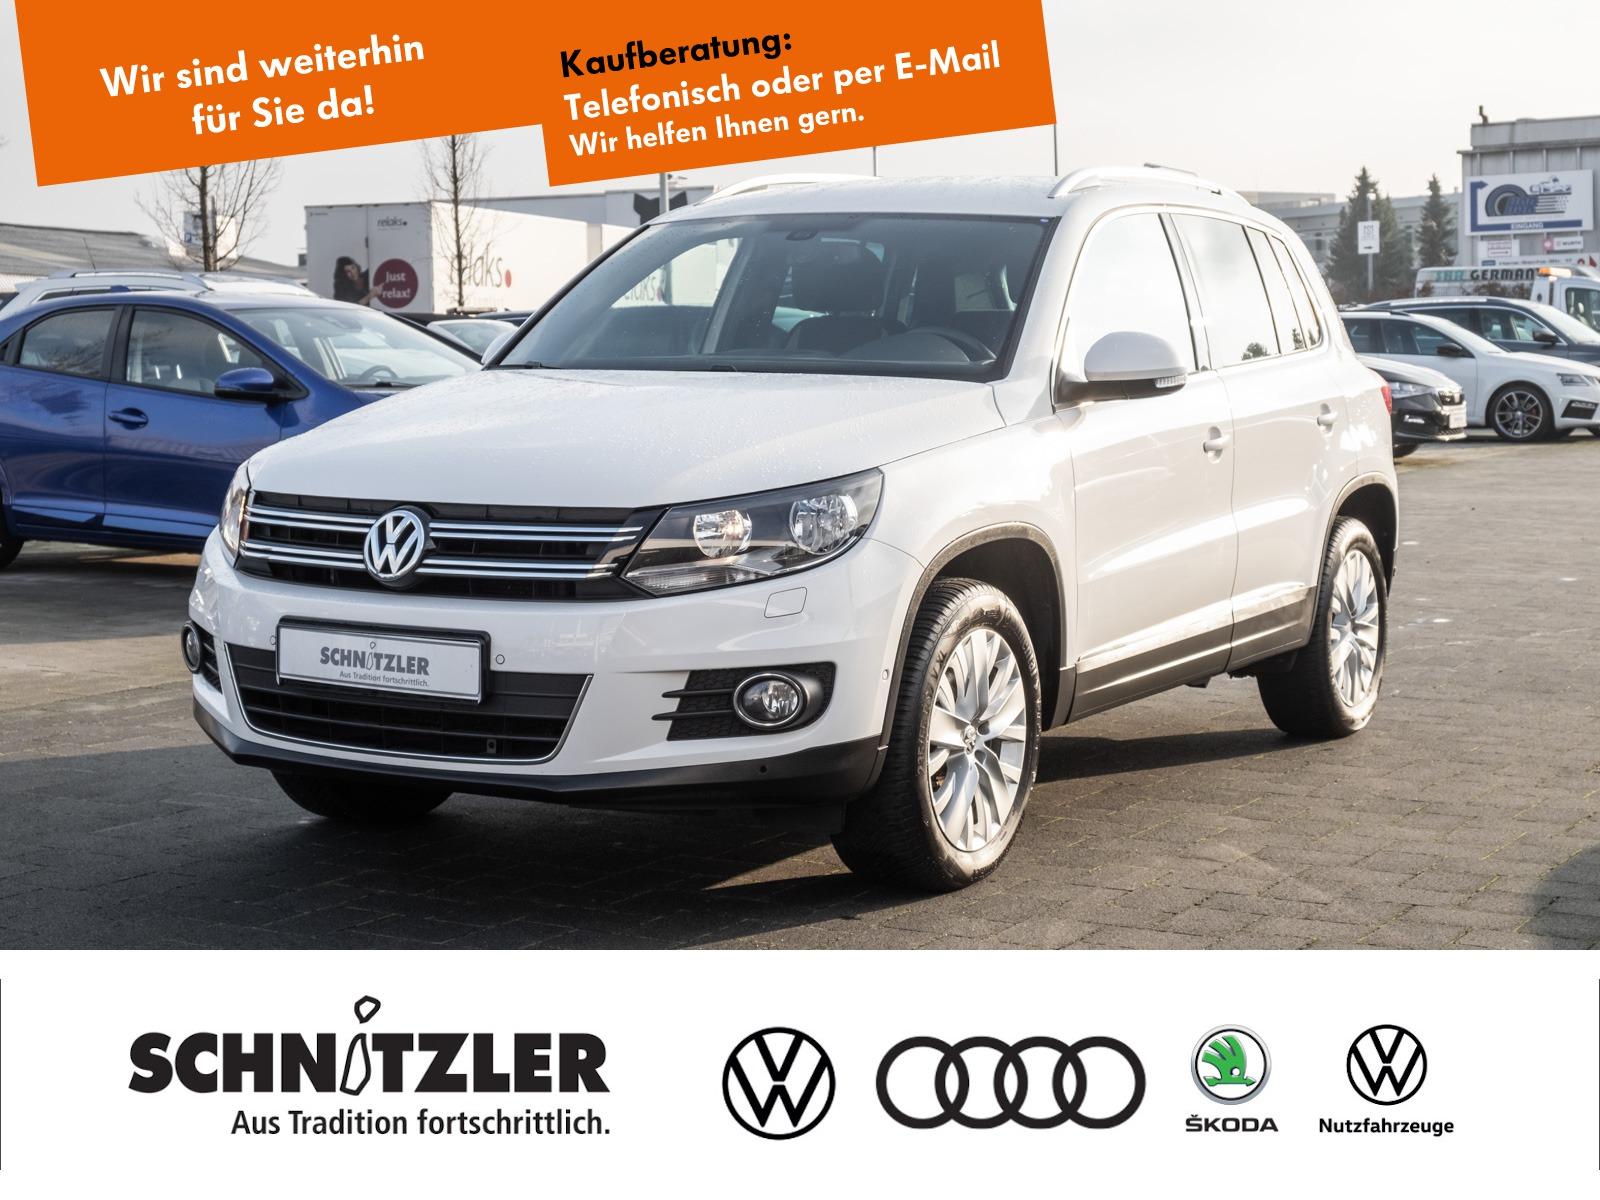 Volkswagen Tiguan 1.4 TSI Life SHZ/PARK ASSIST+++, Jahr 2013, Benzin